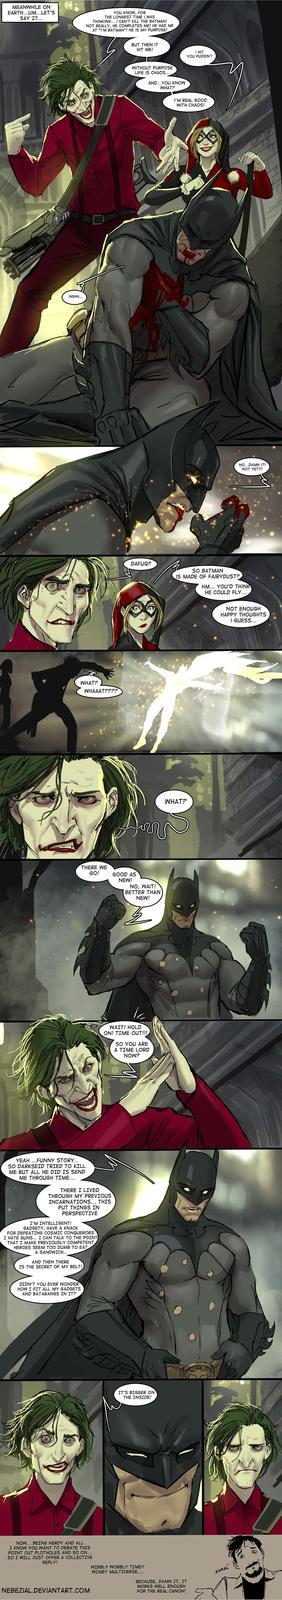 it's simple, we kill the doctor!..no wait..batman!